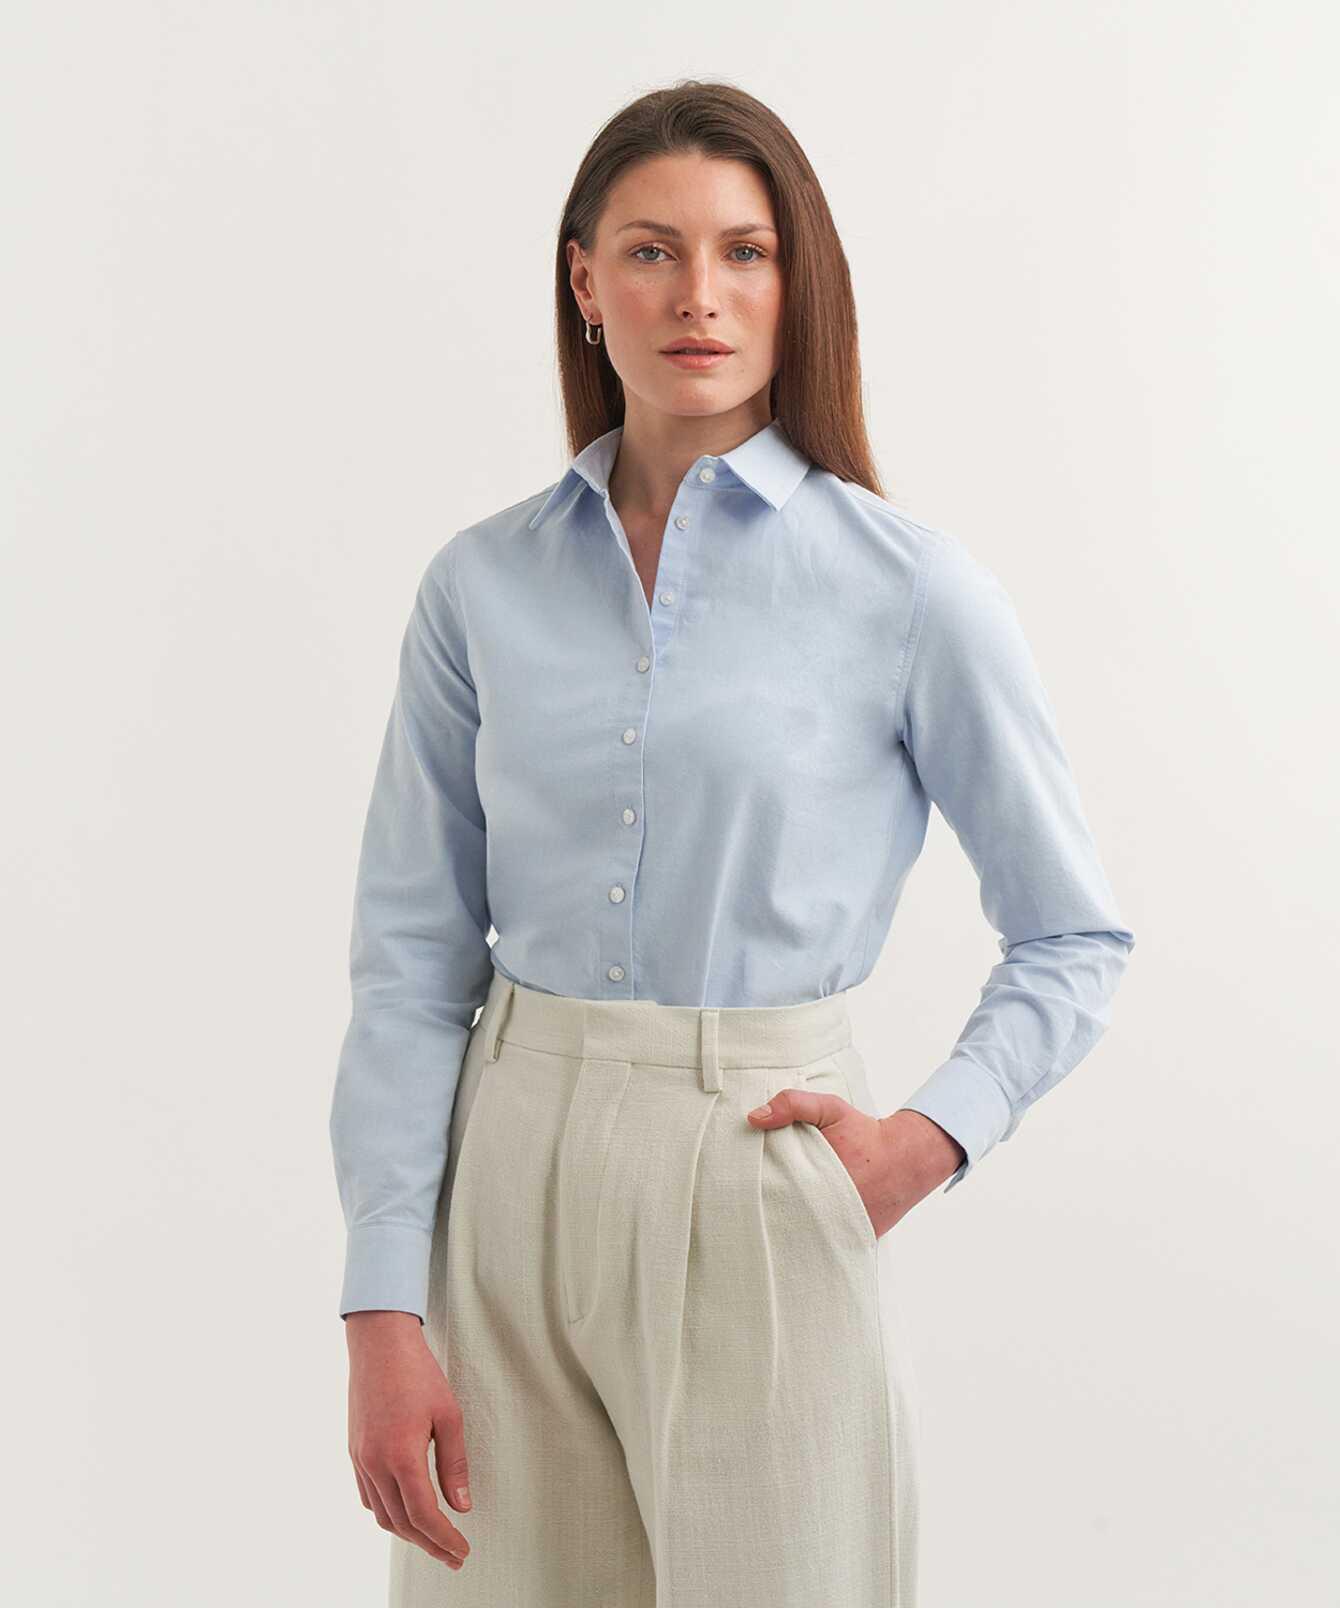 Shirt Tilde Boston Oxford Ljusblå The Shirt Factory